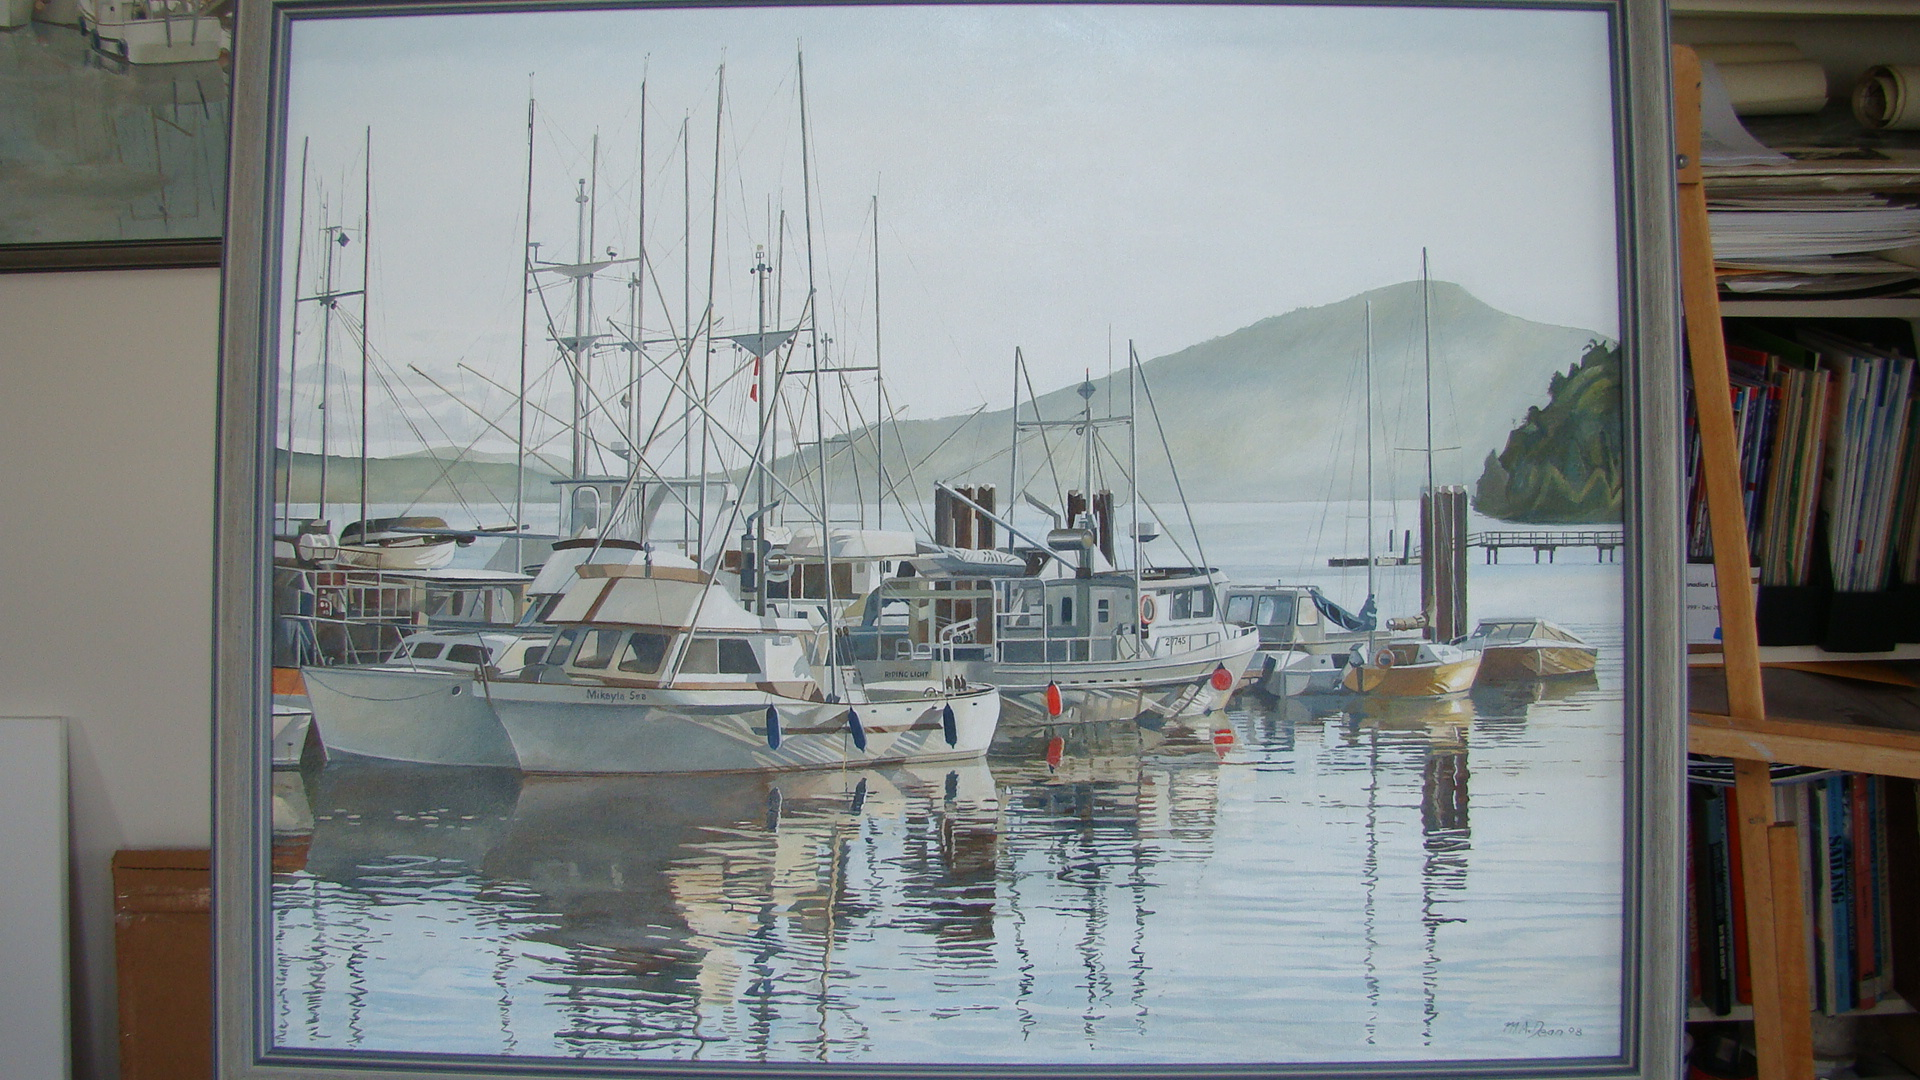 Crofton Docks